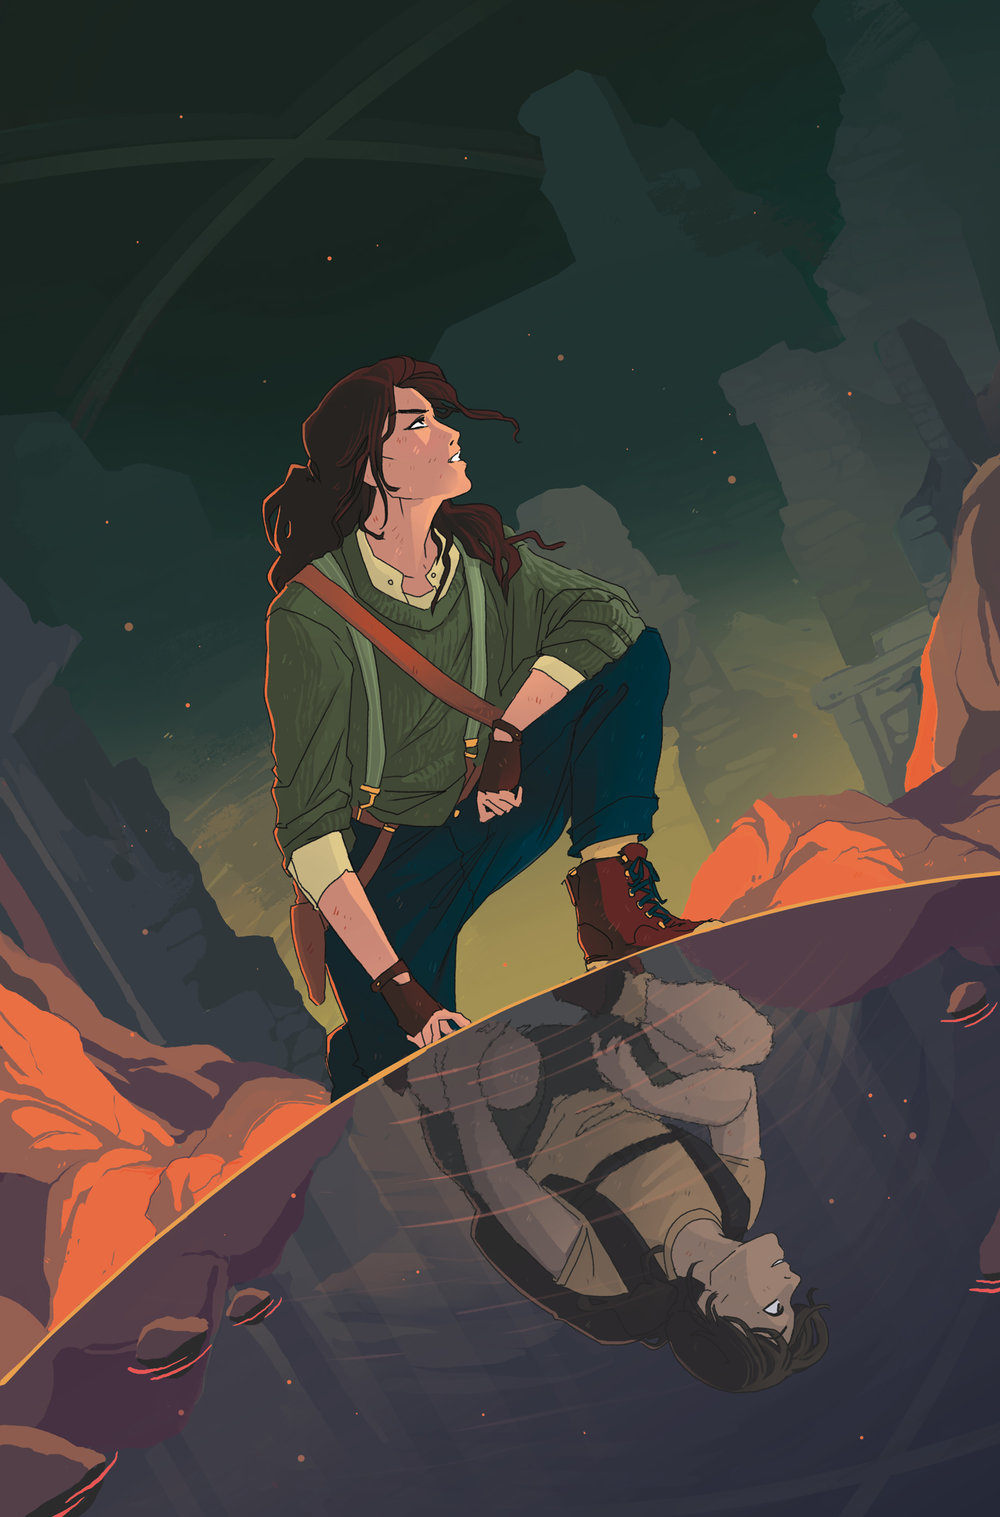 Cover  - Tomb Raider: Survivor's Crusade  #3 - Dark Horse Comics